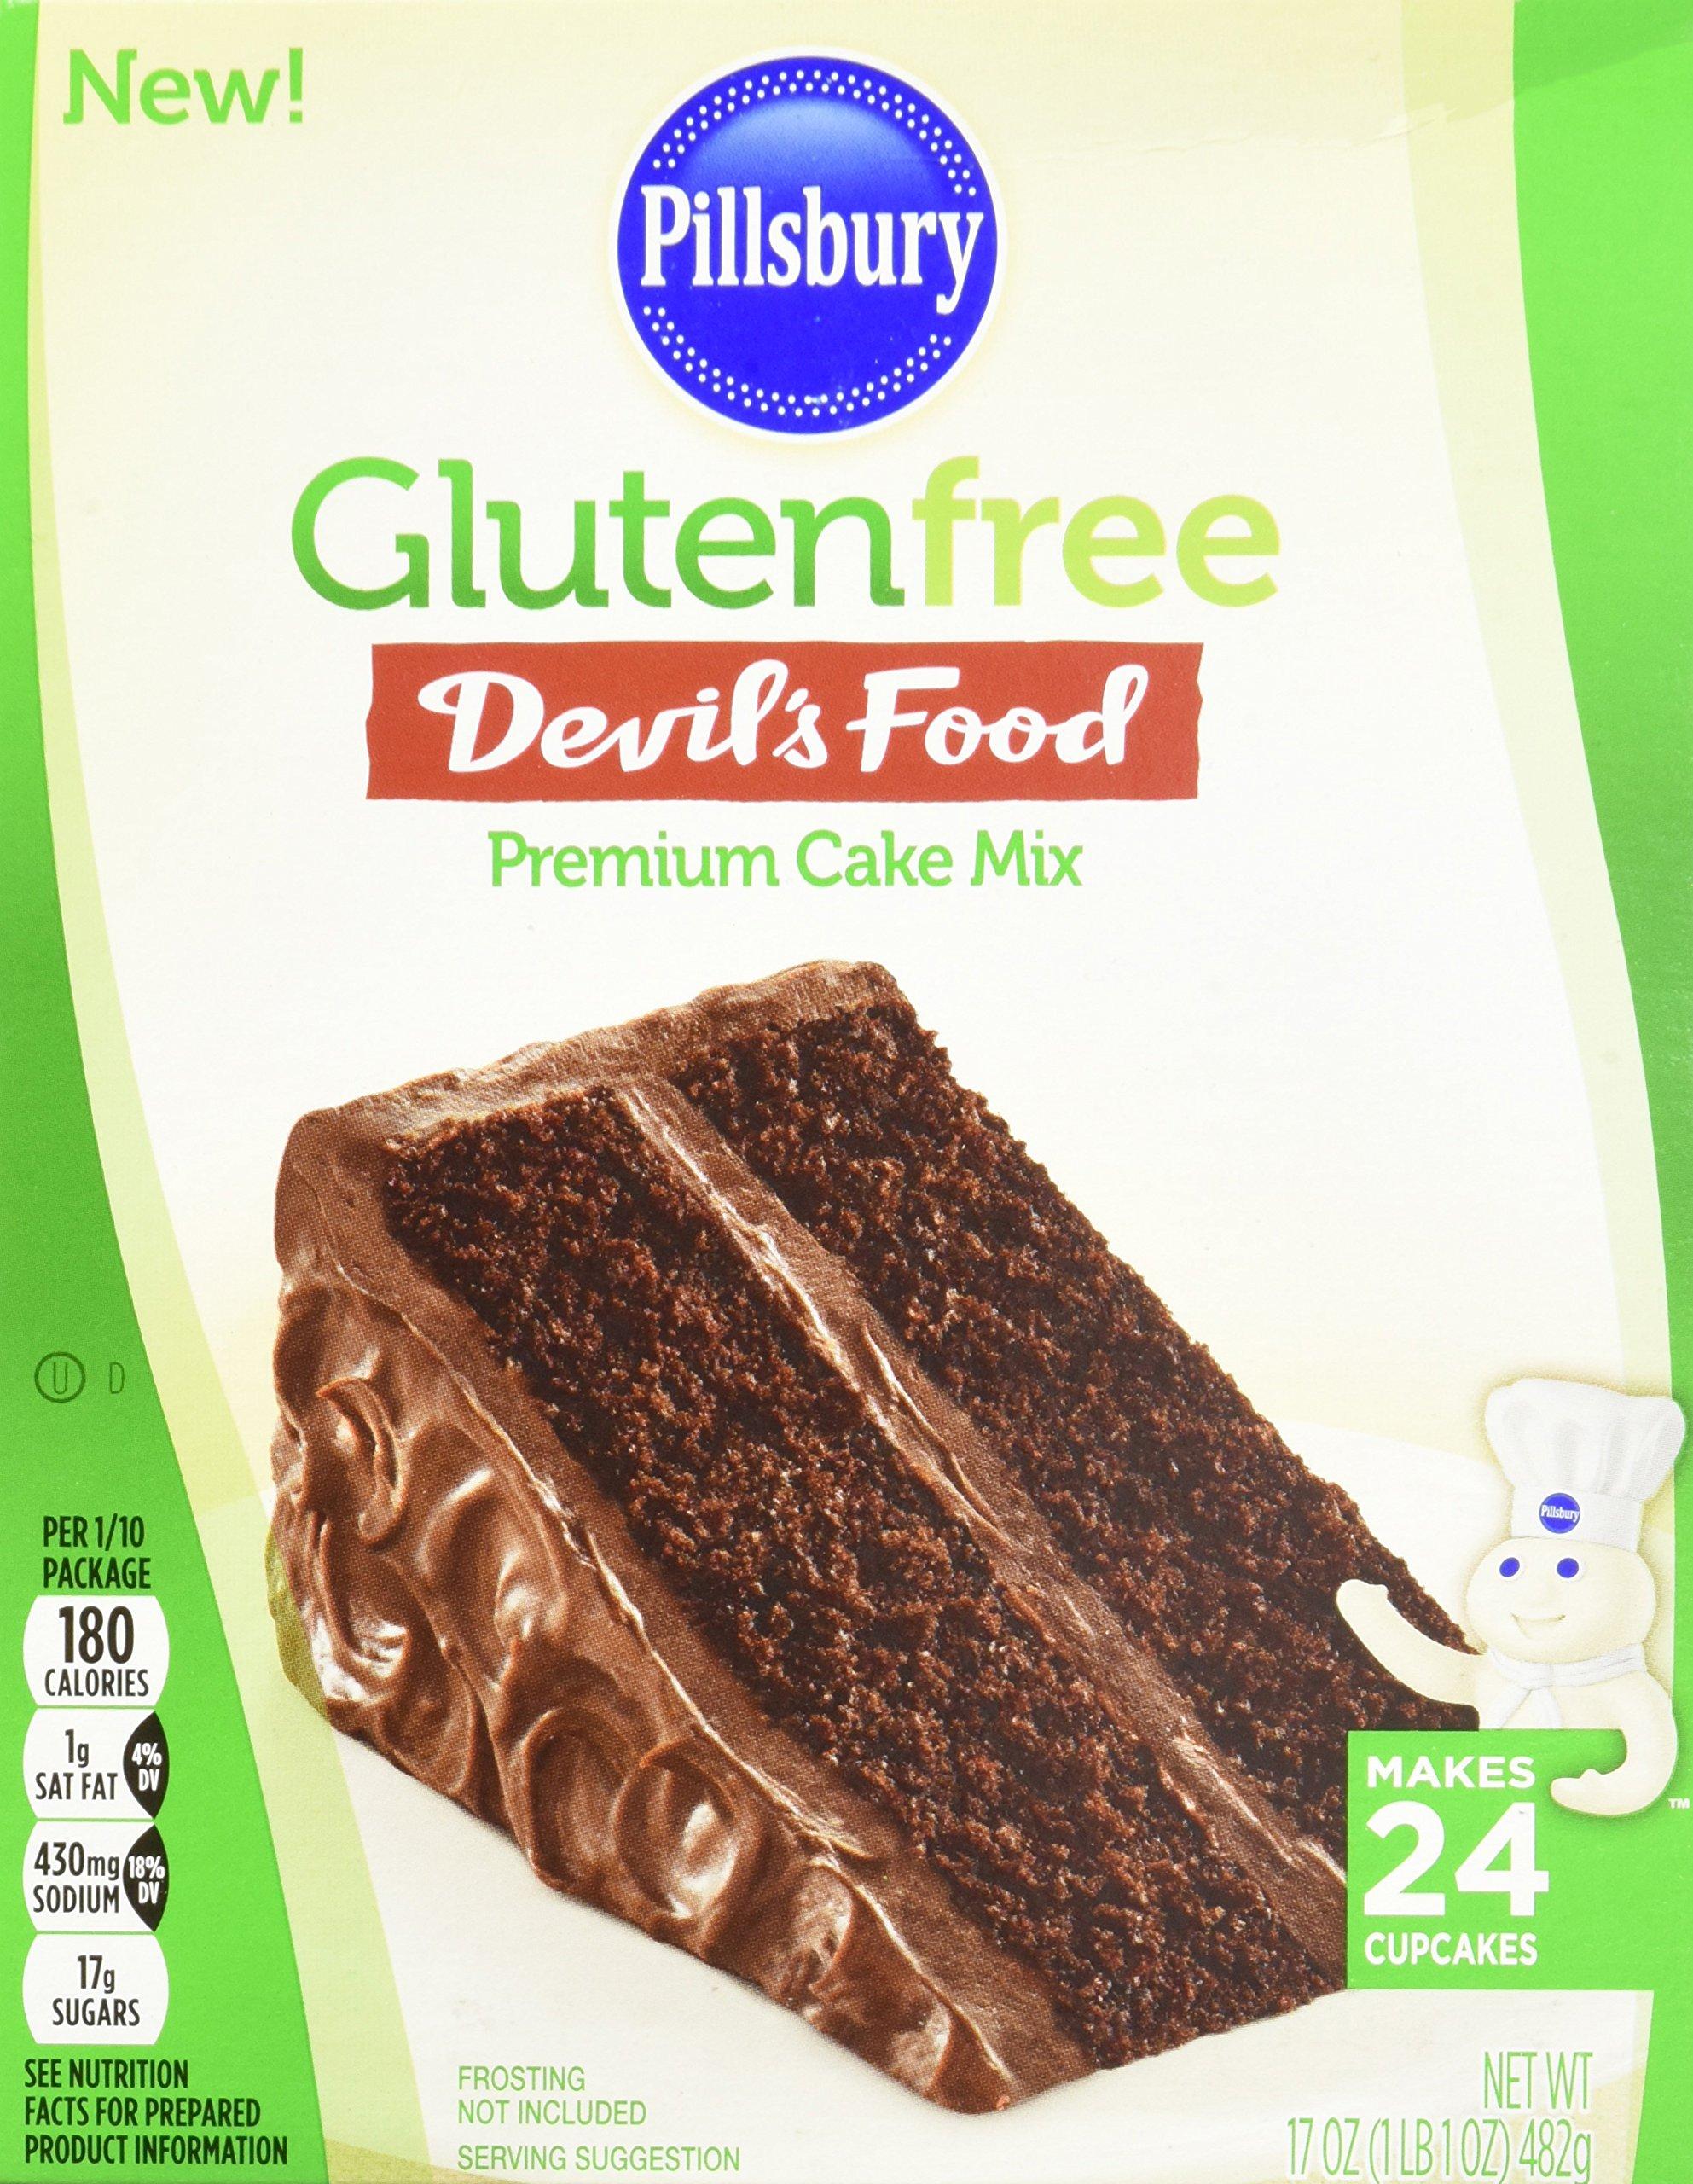 Pillsbury Gluten-Free Devils Food Premium Cake Mix, 17 Ounce (Pack of 12)